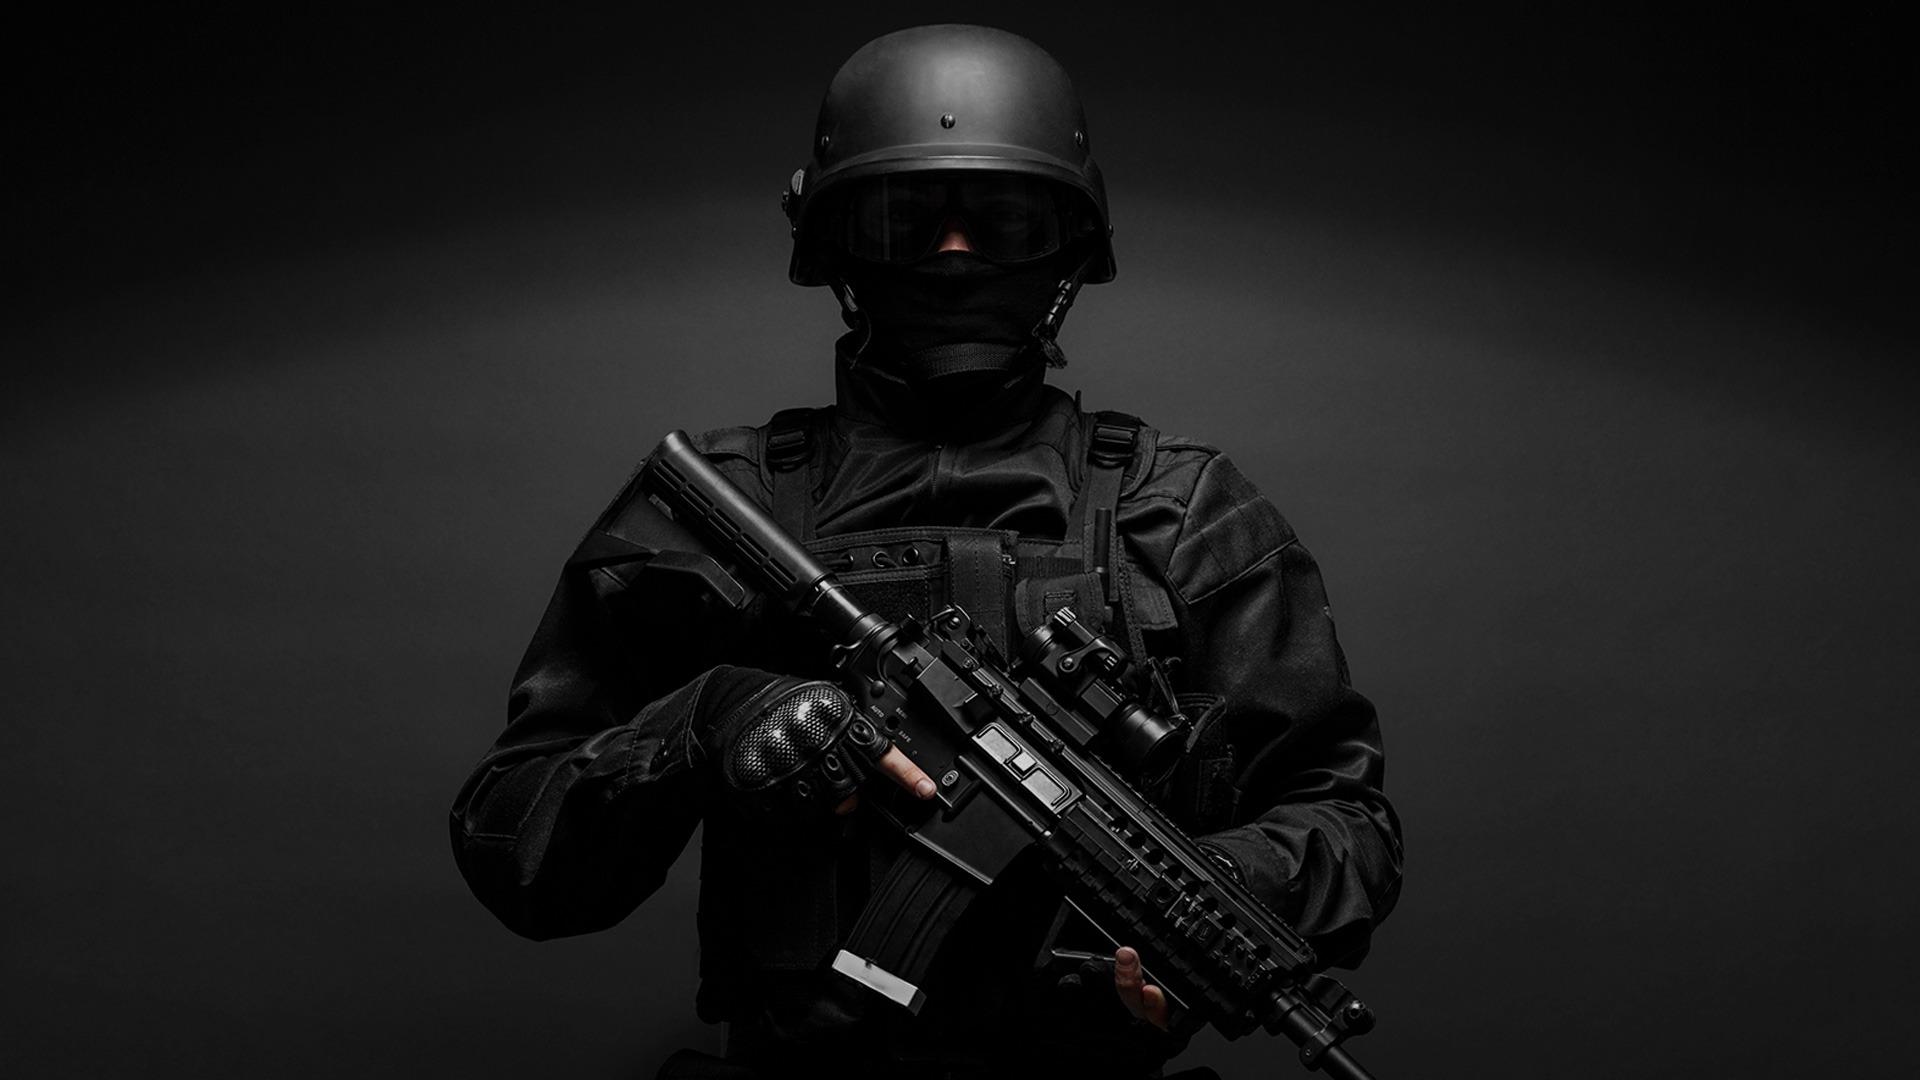 Breaching Swat Police Military Equipment